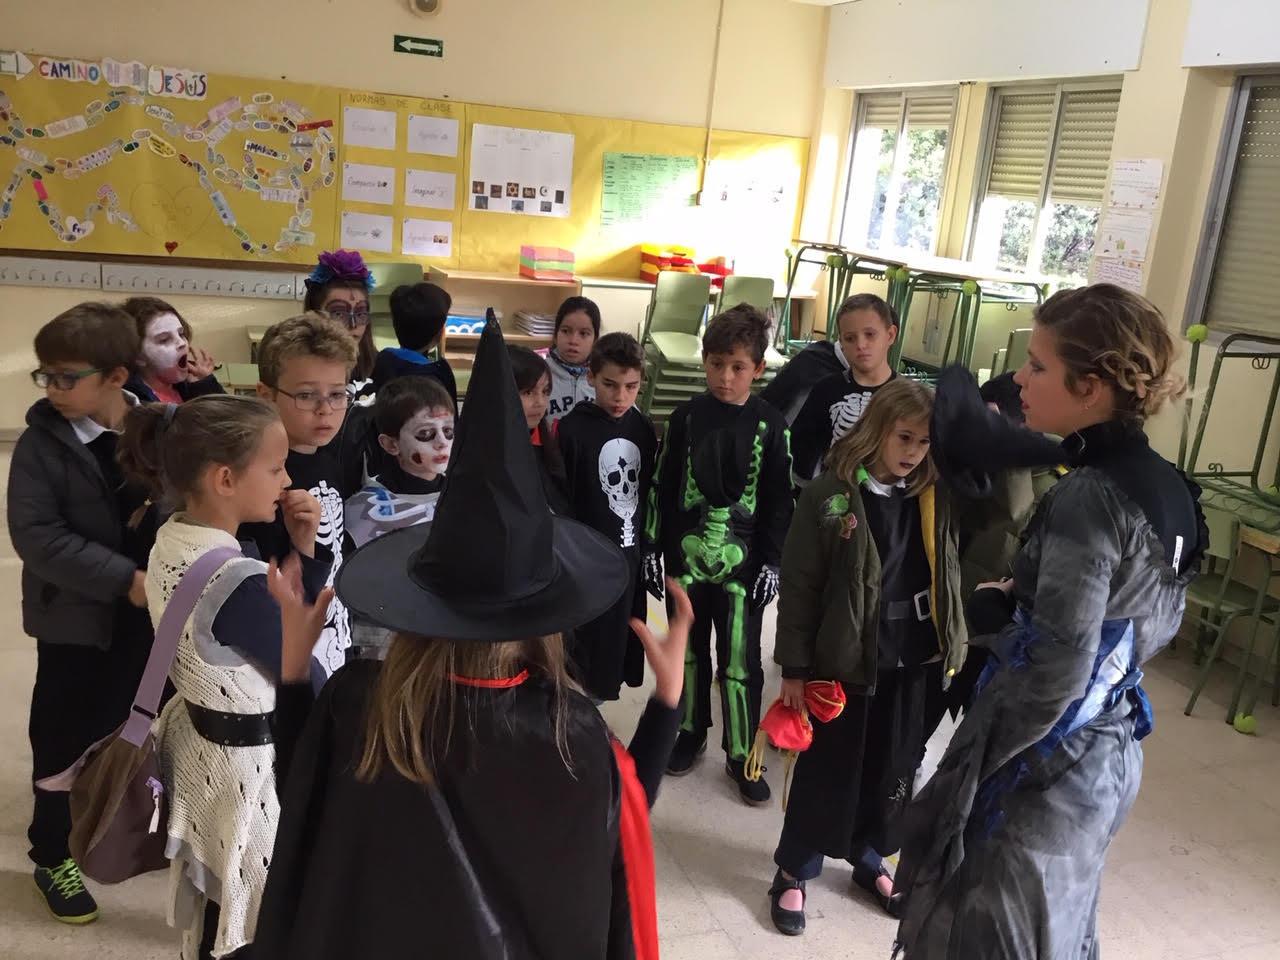 2018_10_31_Cuarto B disfruta en Halloween_CEIP FDLR_Las Rozas 12